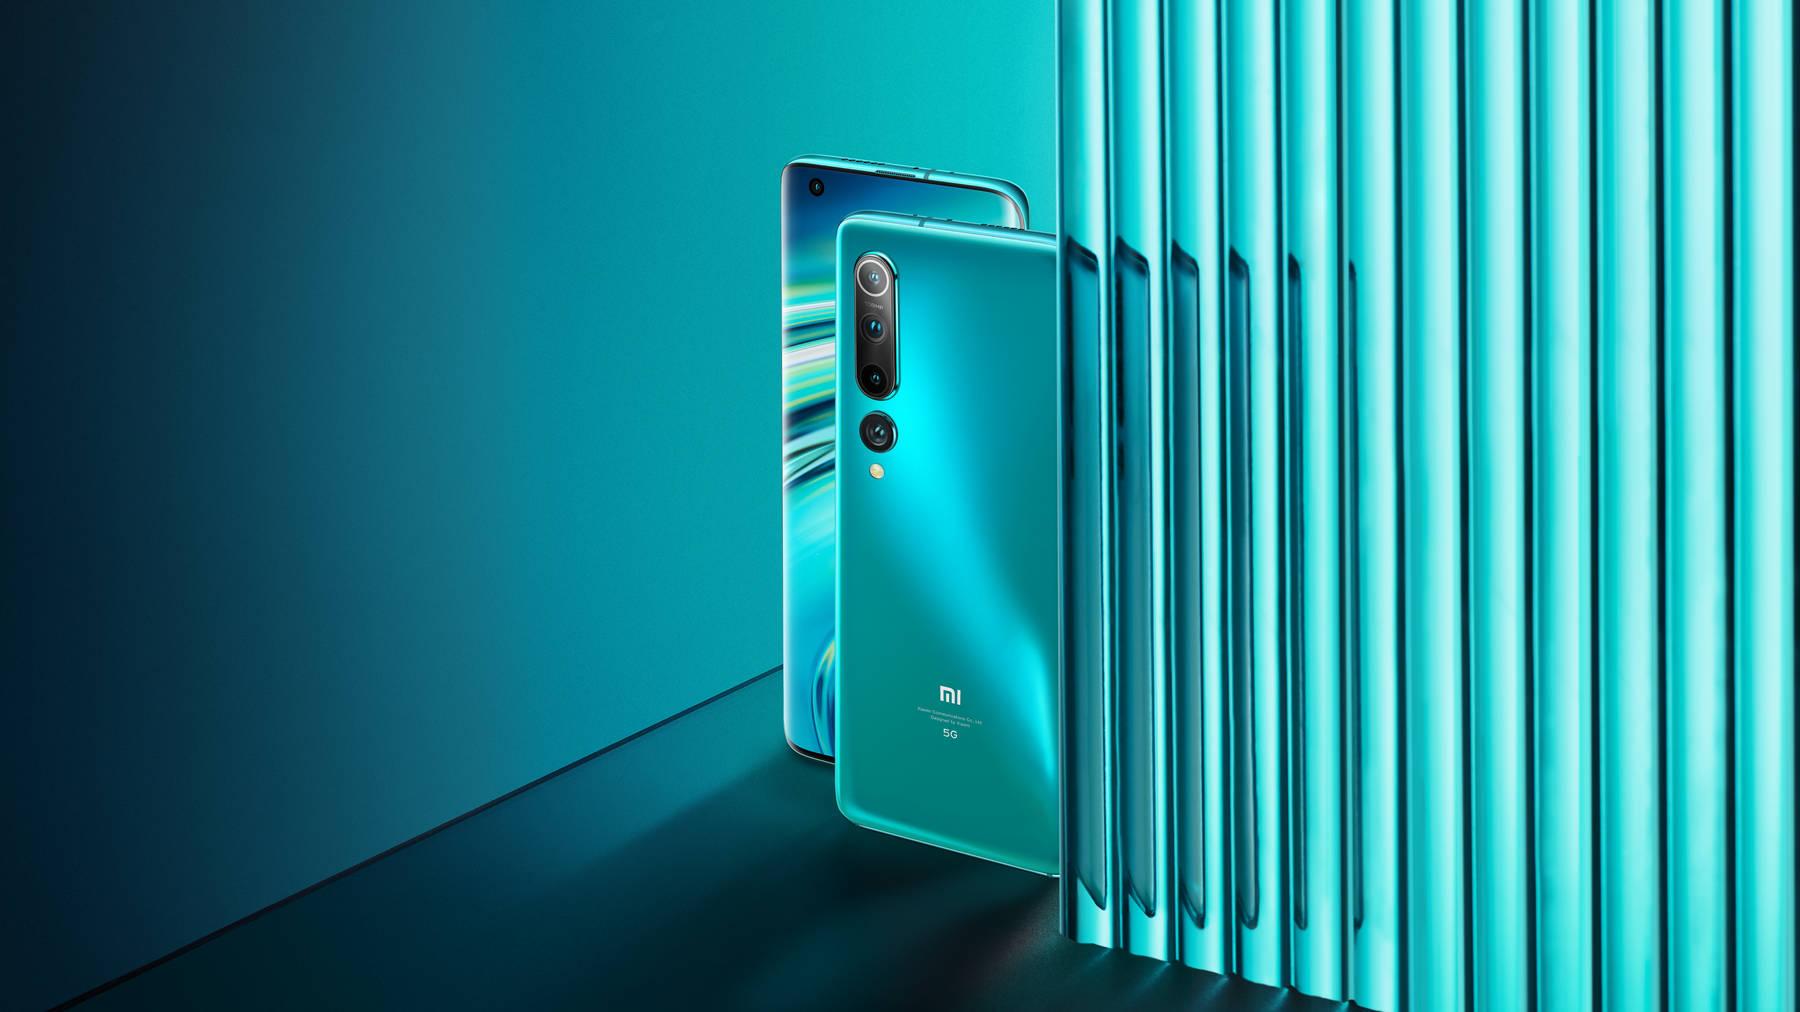 Xiaomi เปิดราคาไทย Mi 10 ที่ 27,999 บาท เริ่มขาย 8 พ.ค. ส่วน Mi 10 ...